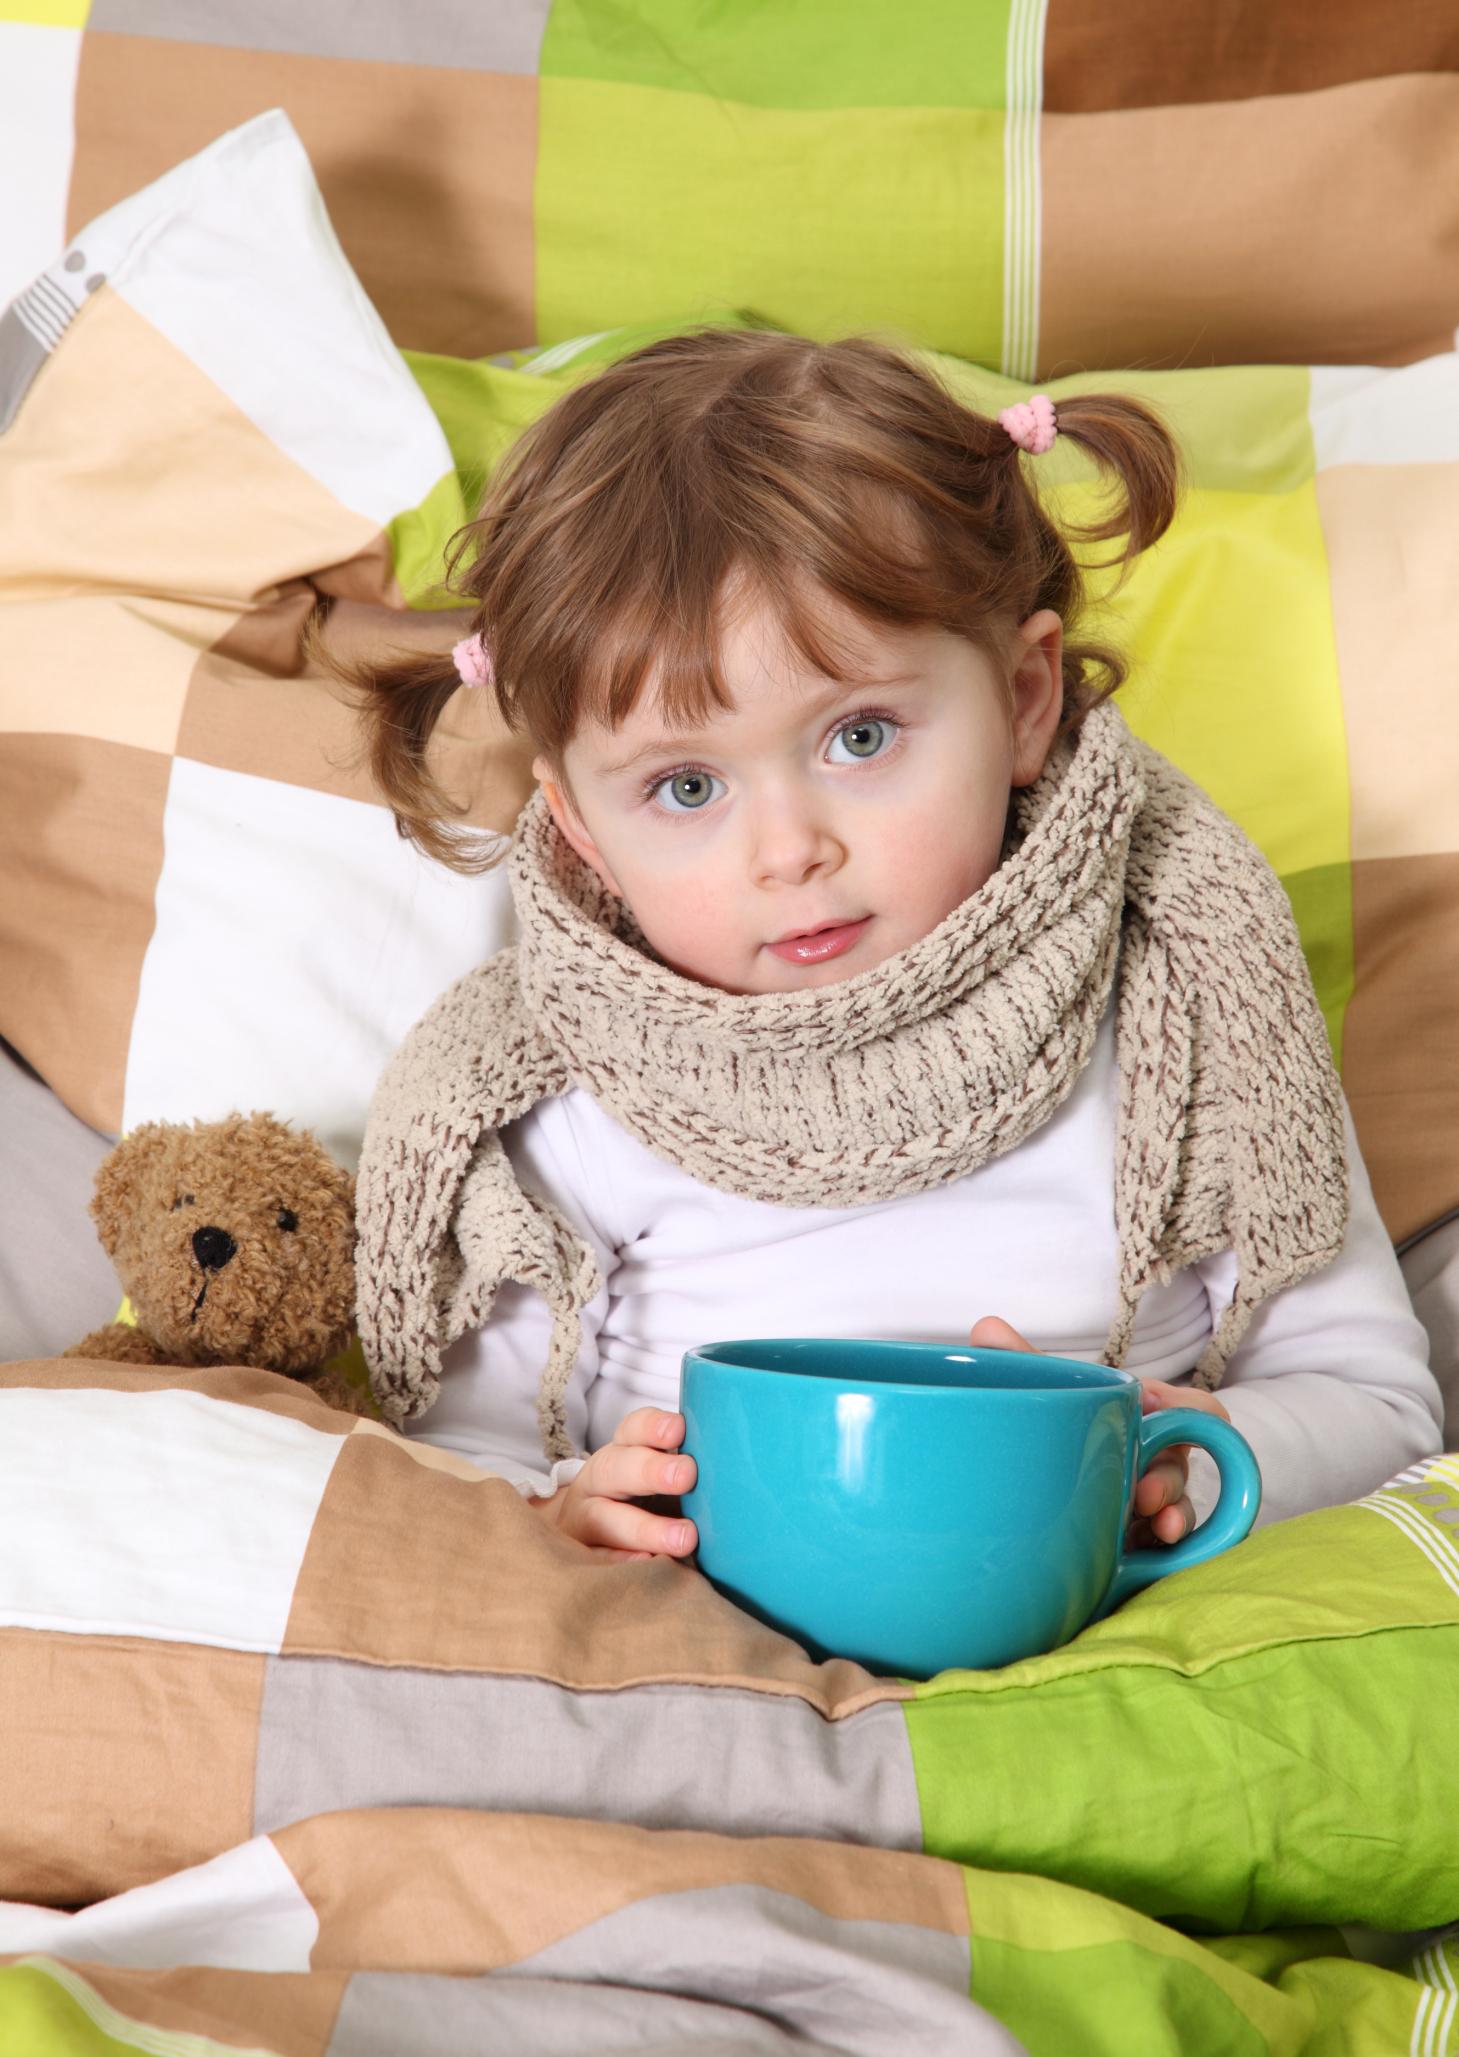 Little girl sick